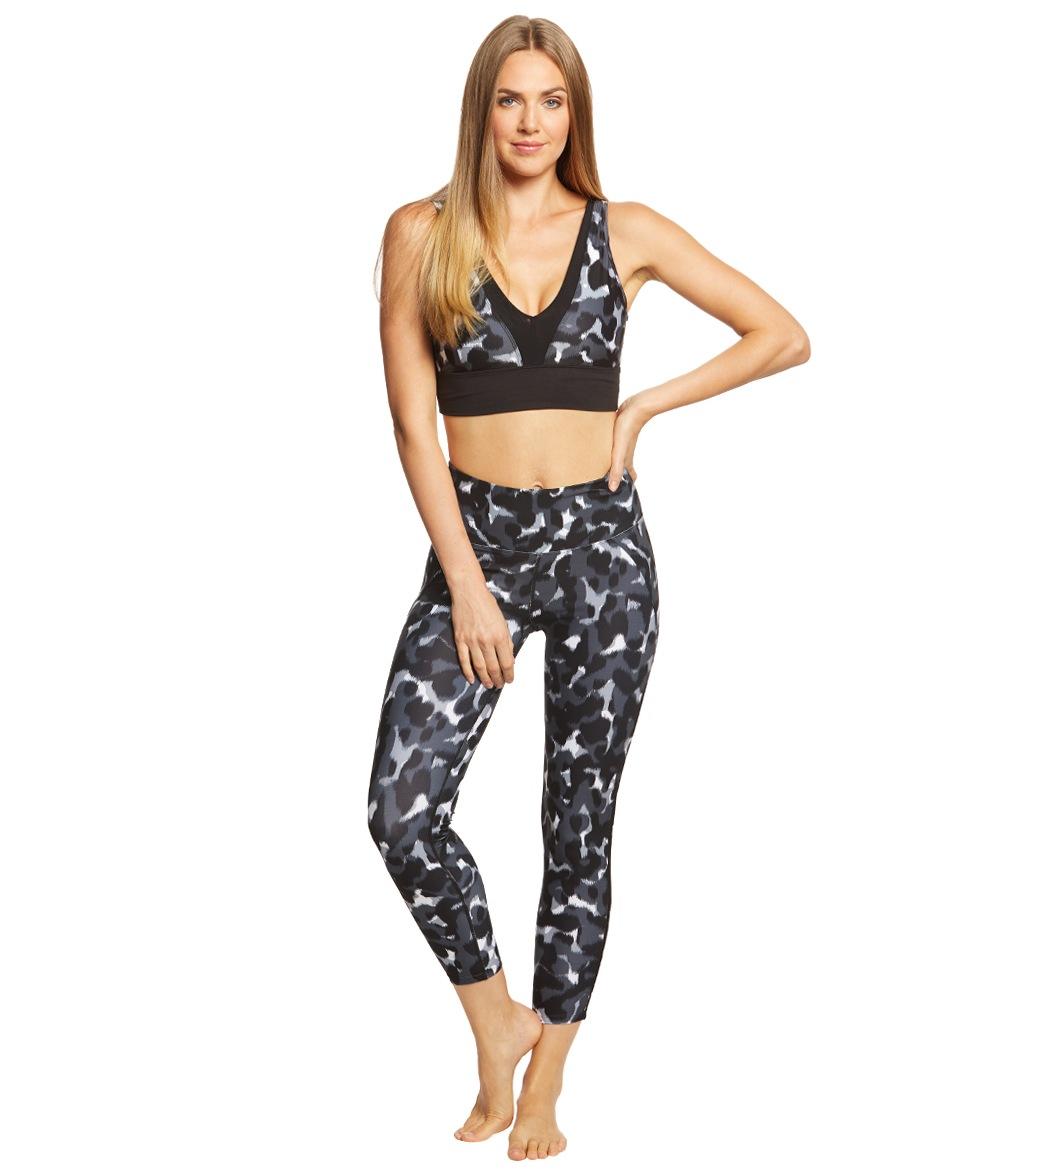 2a5d82e9472ec Betsey Johnson Performance Printed Mesh Trim 7/8 Yoga Leggings at ...